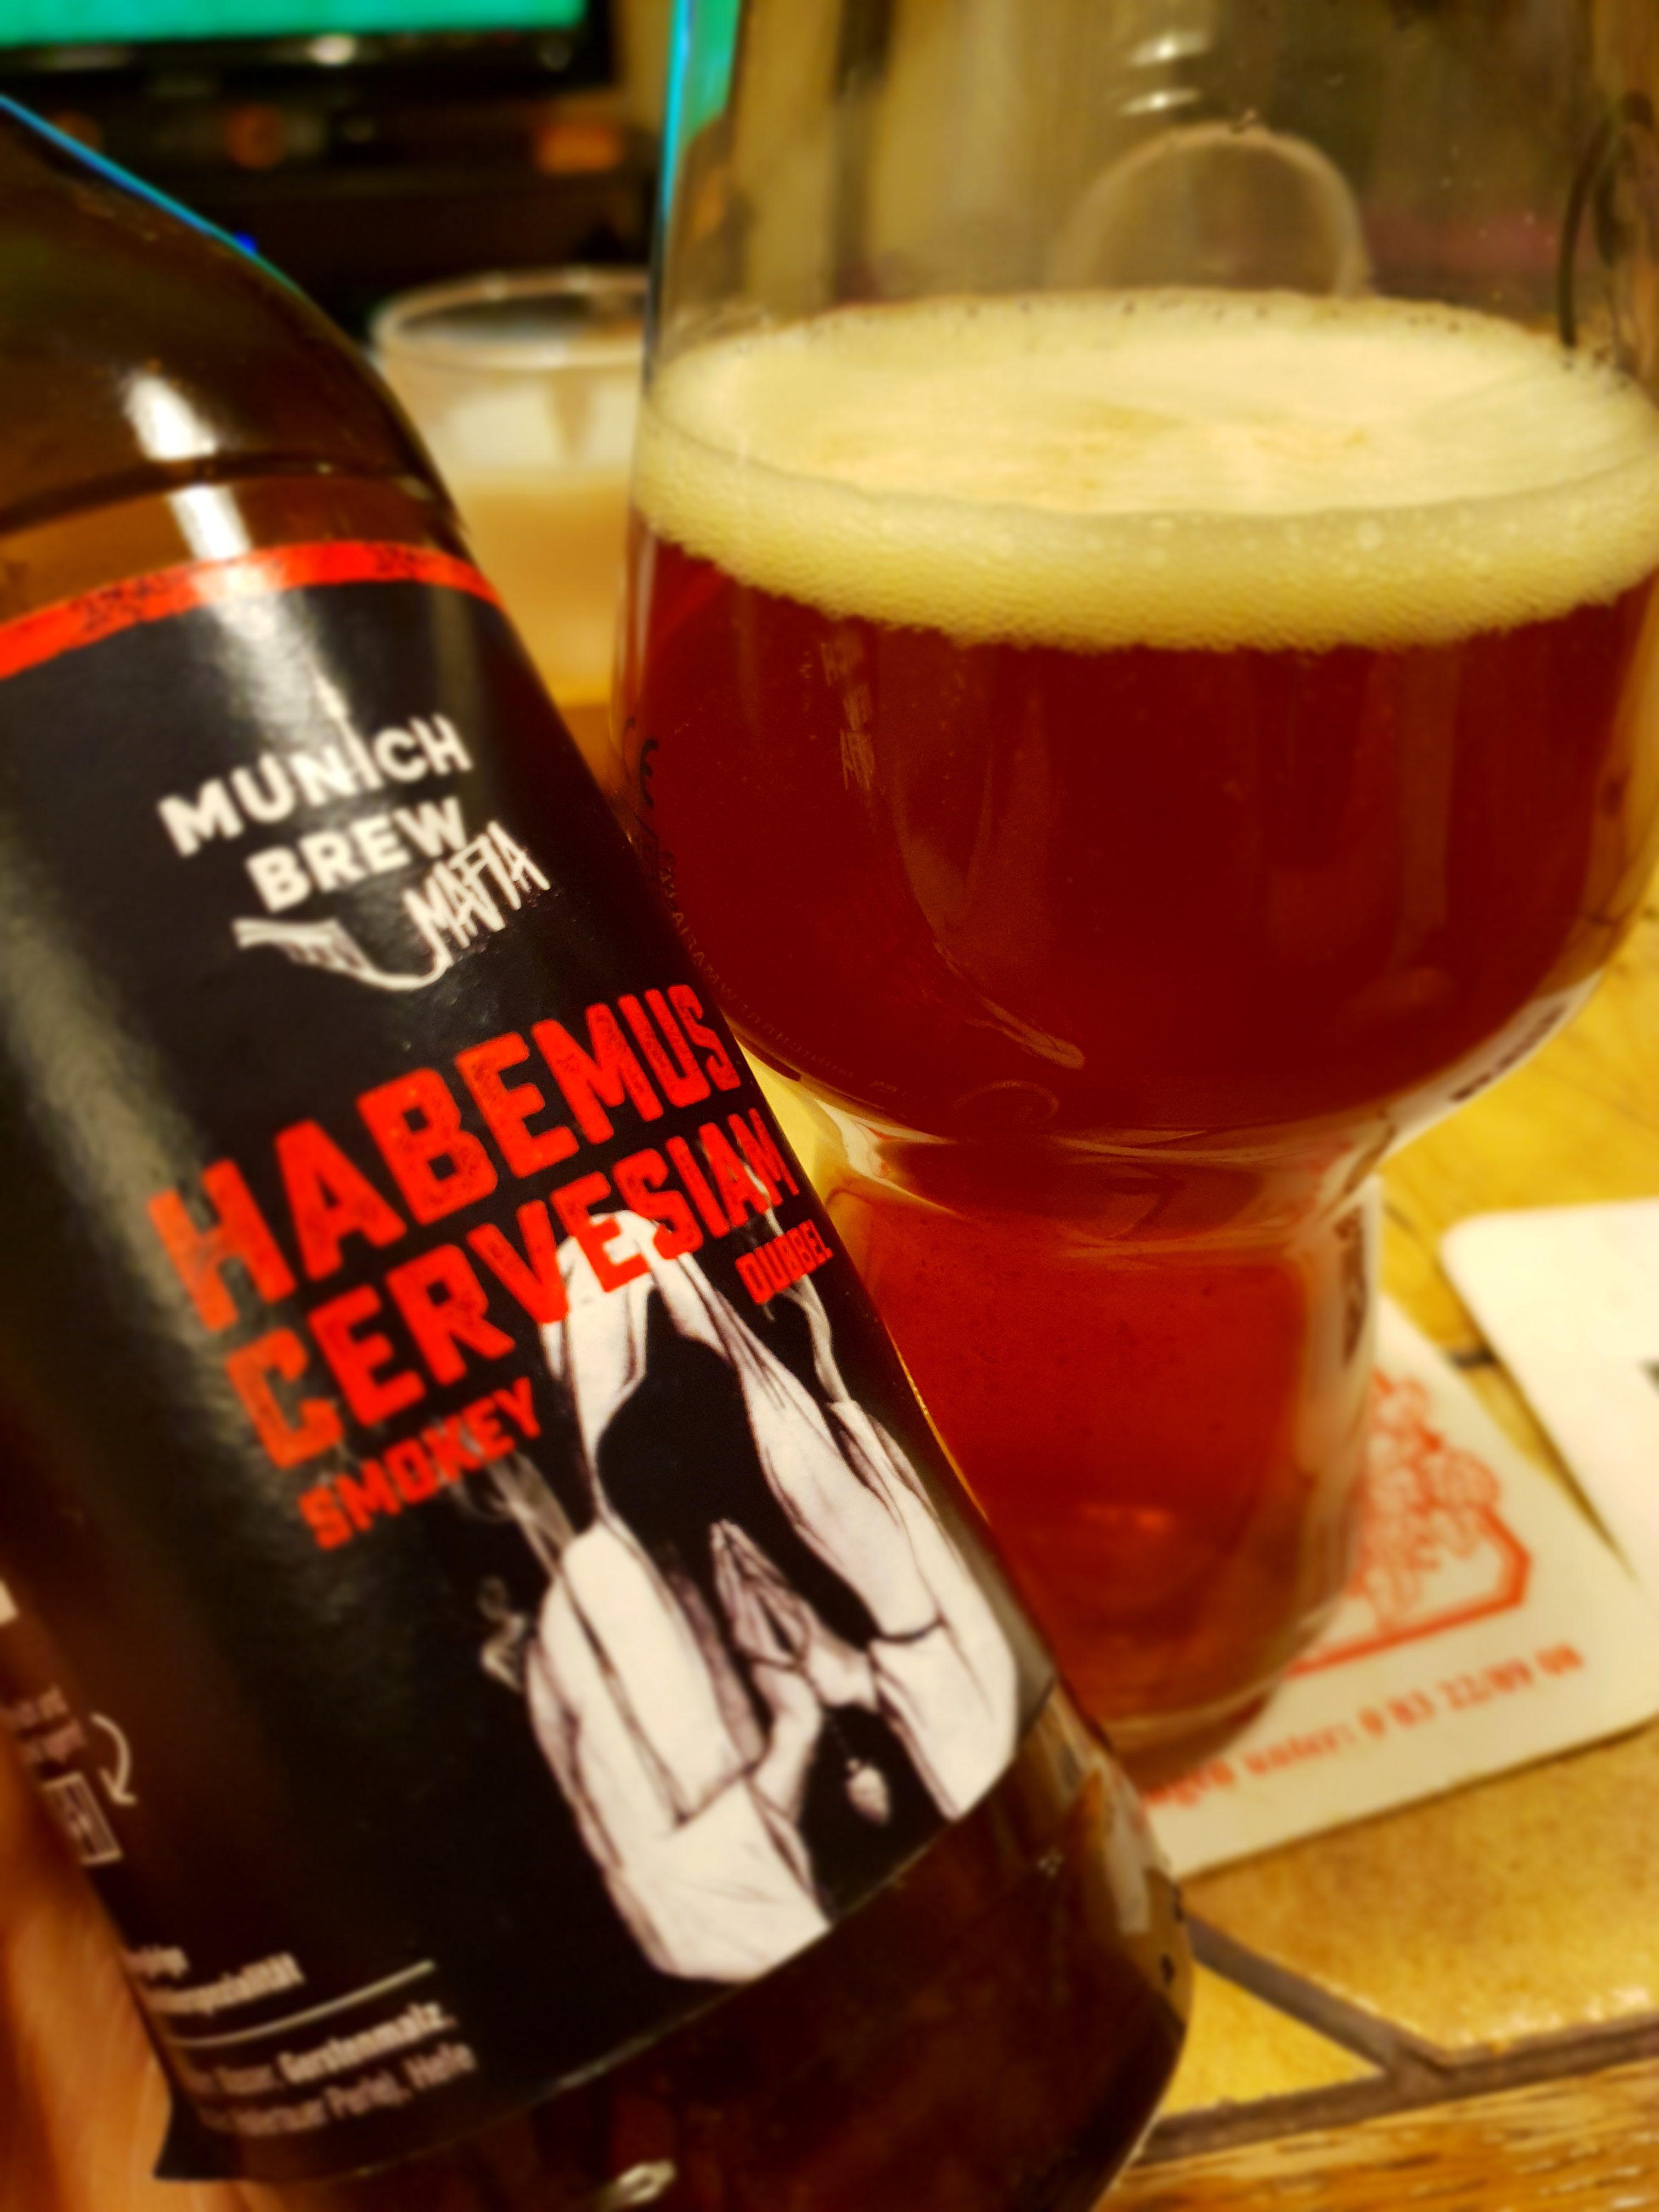 Munich Brew Mafia – Habemus Cervesiam